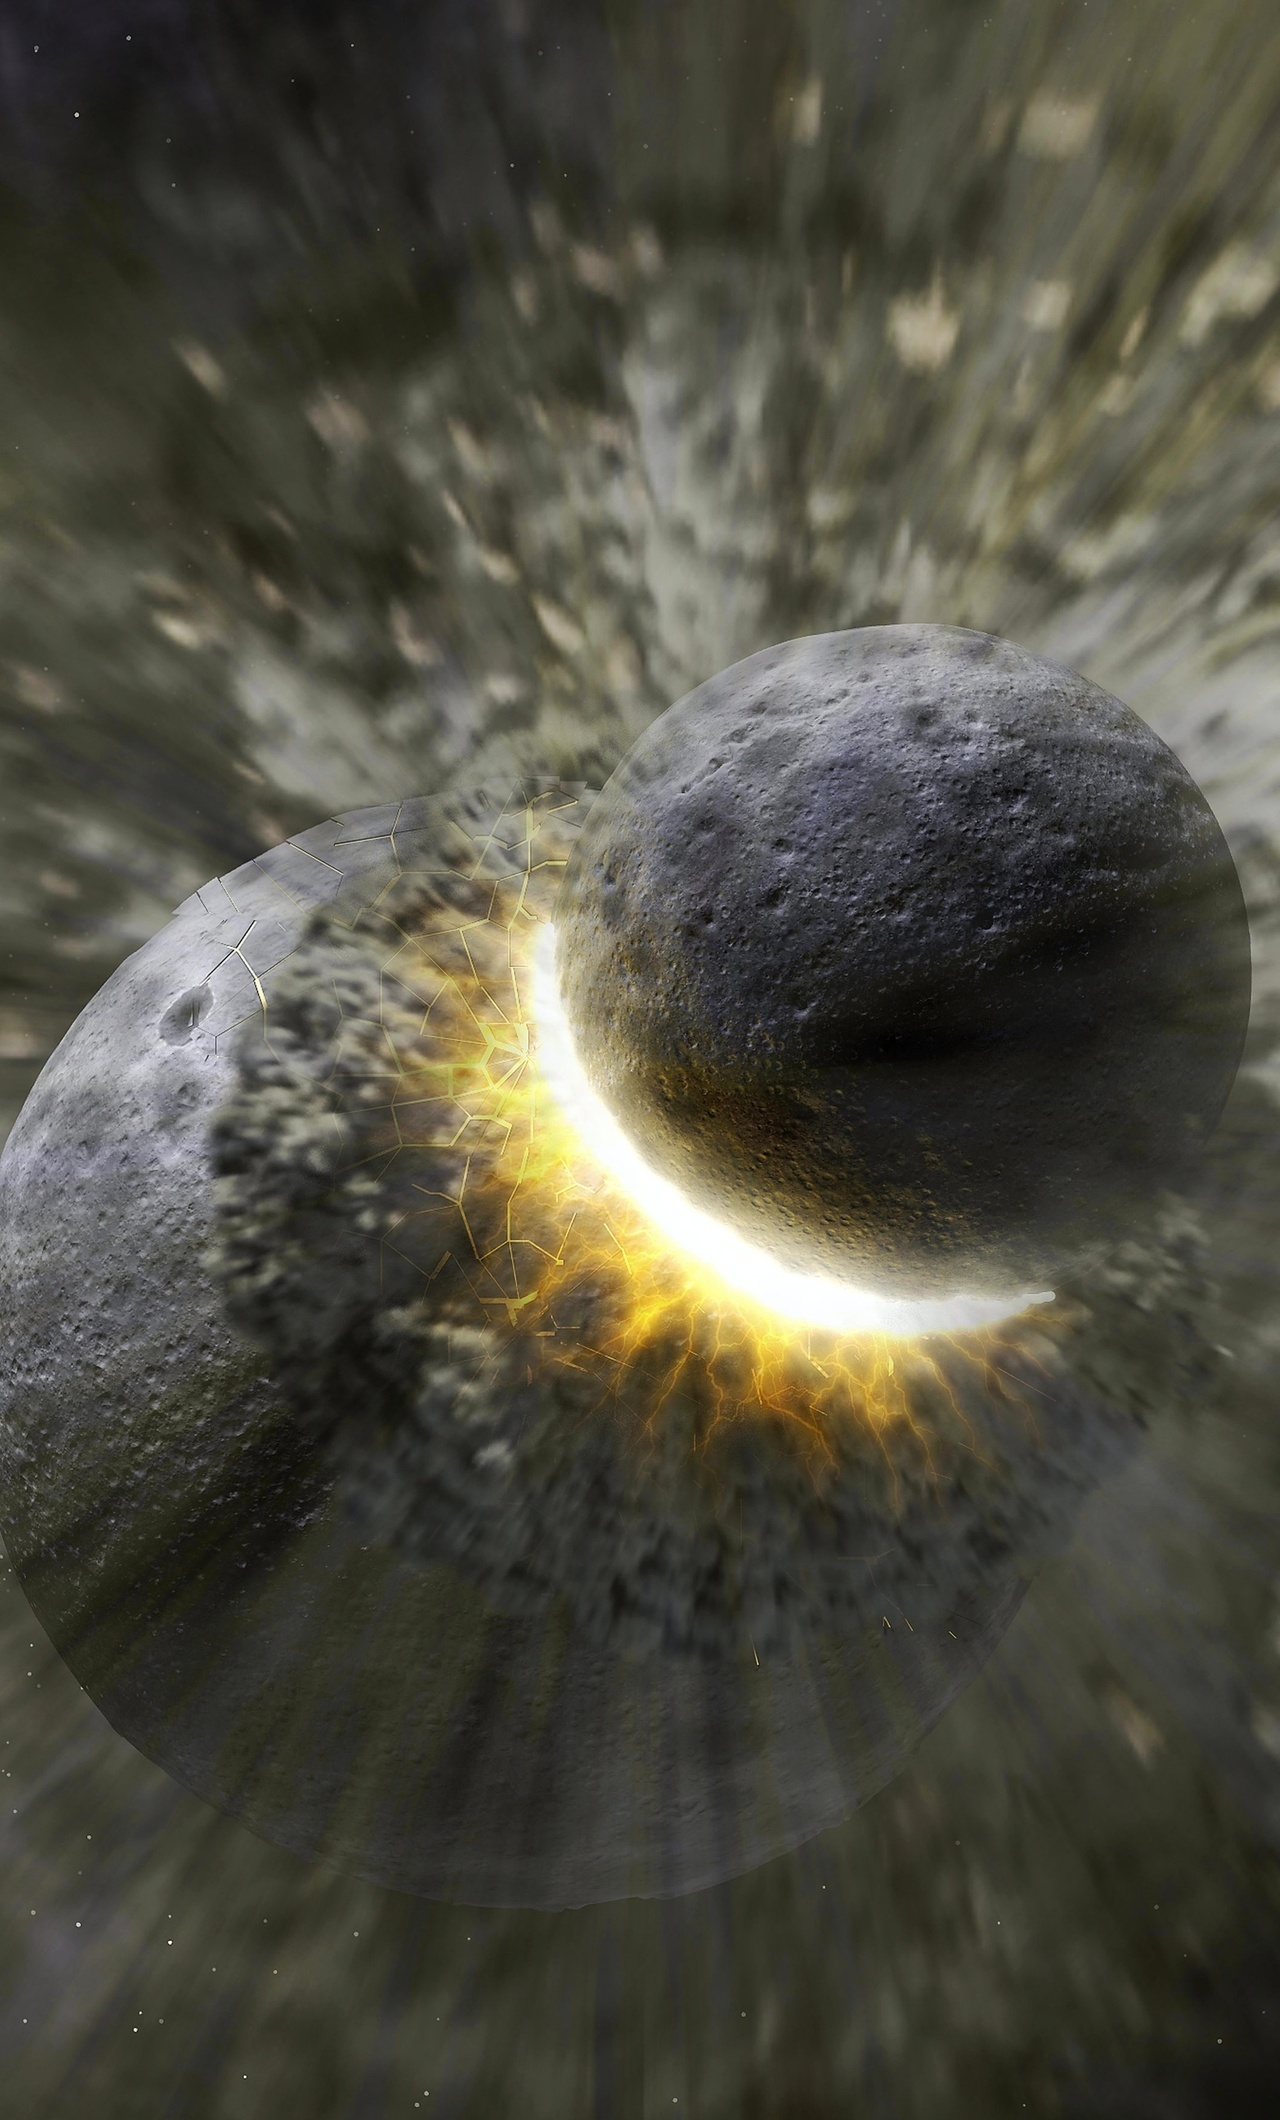 planets-collision-4k-5b.jpg